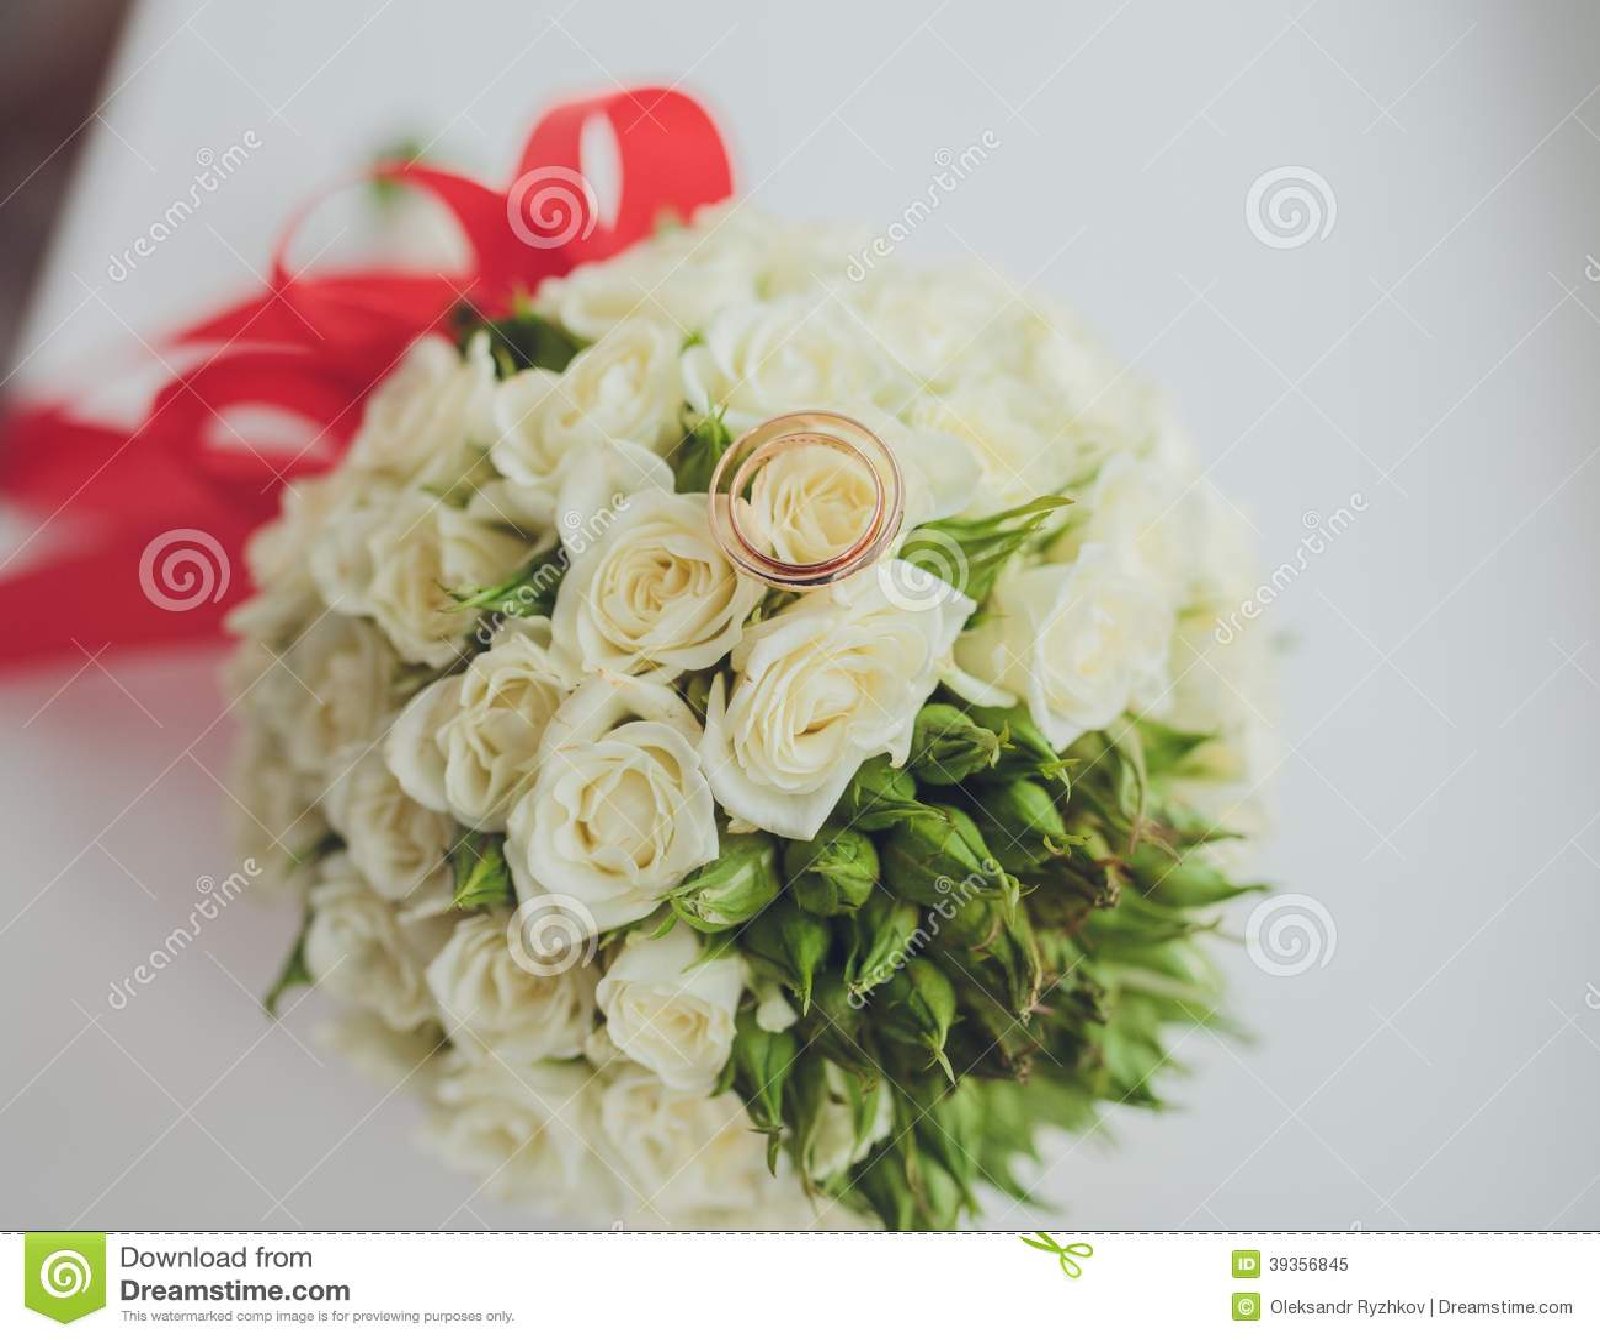 Beautiful Flowers For Weddings: Beautiful Bouquet Of Wedding Flowers Stock Image